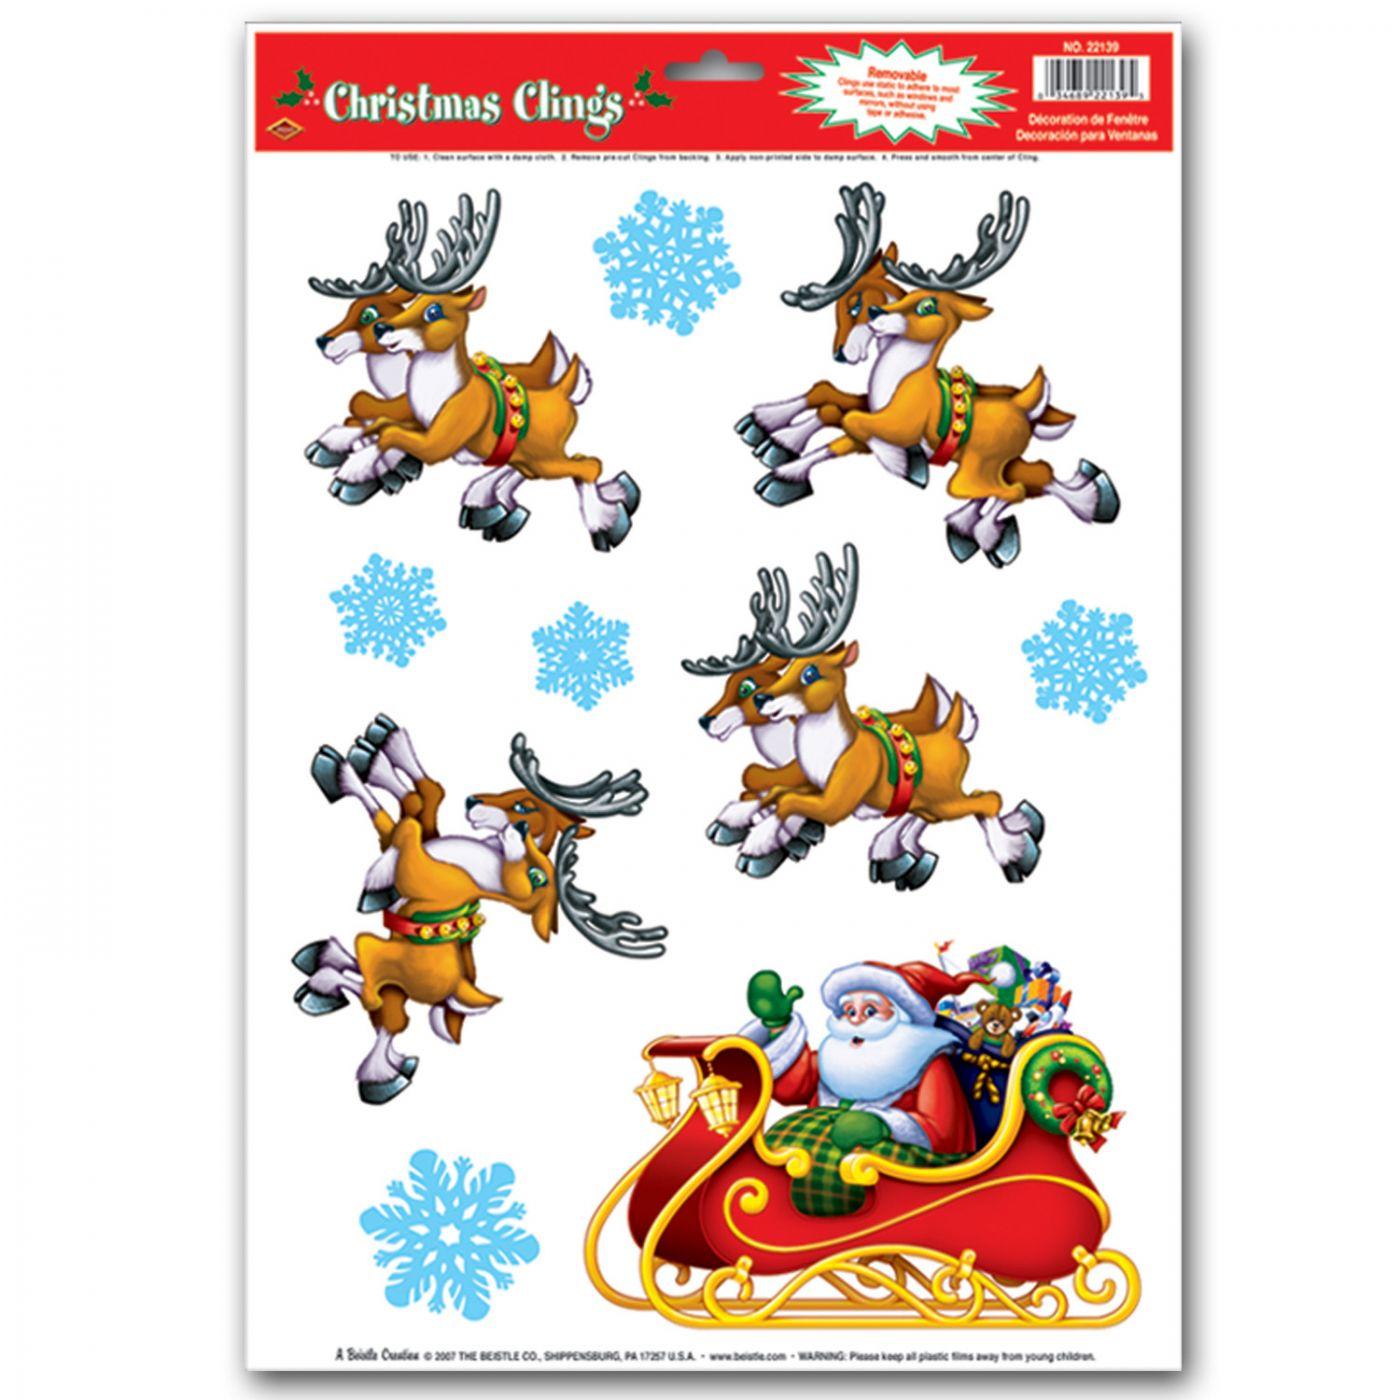 Santa & Sleigh Clings image